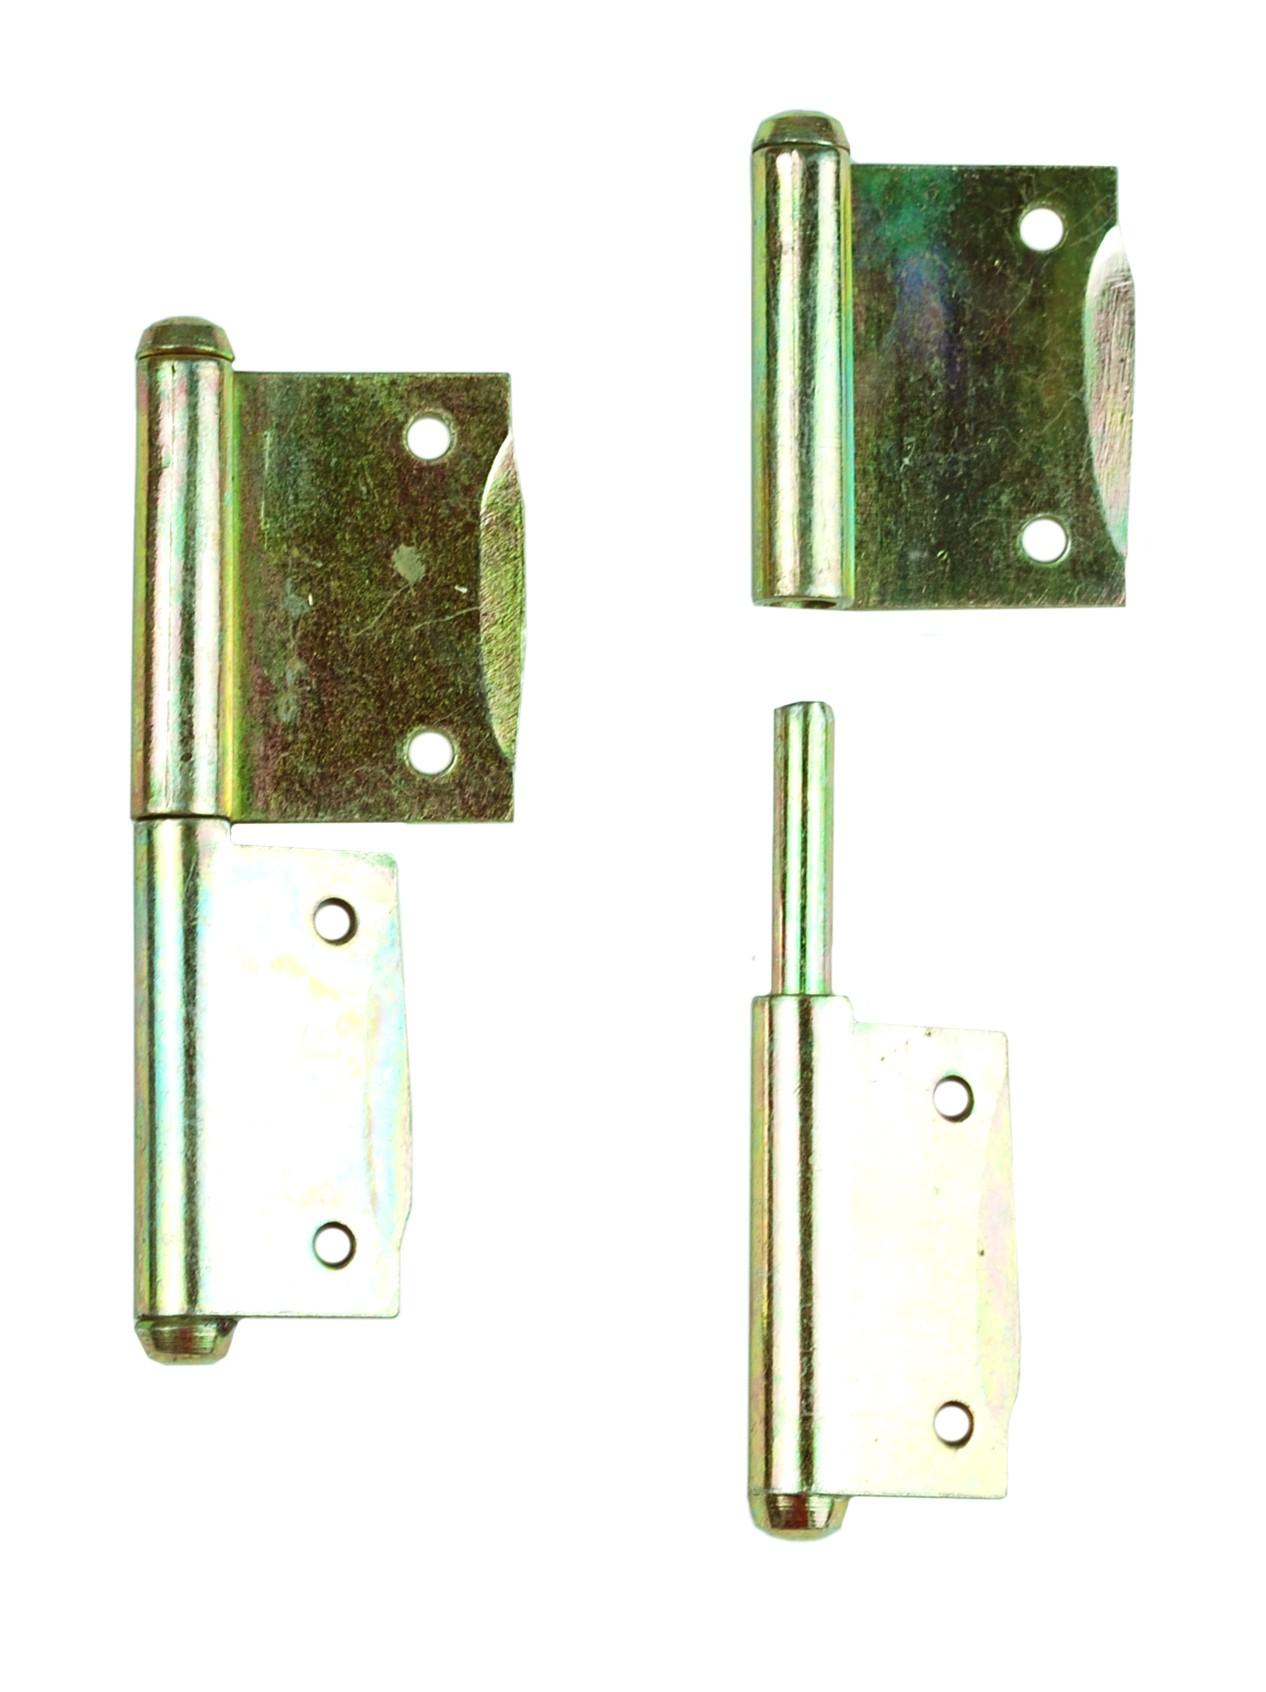 Westfalia cupboard door hinges a pair L-R SO23 SO43